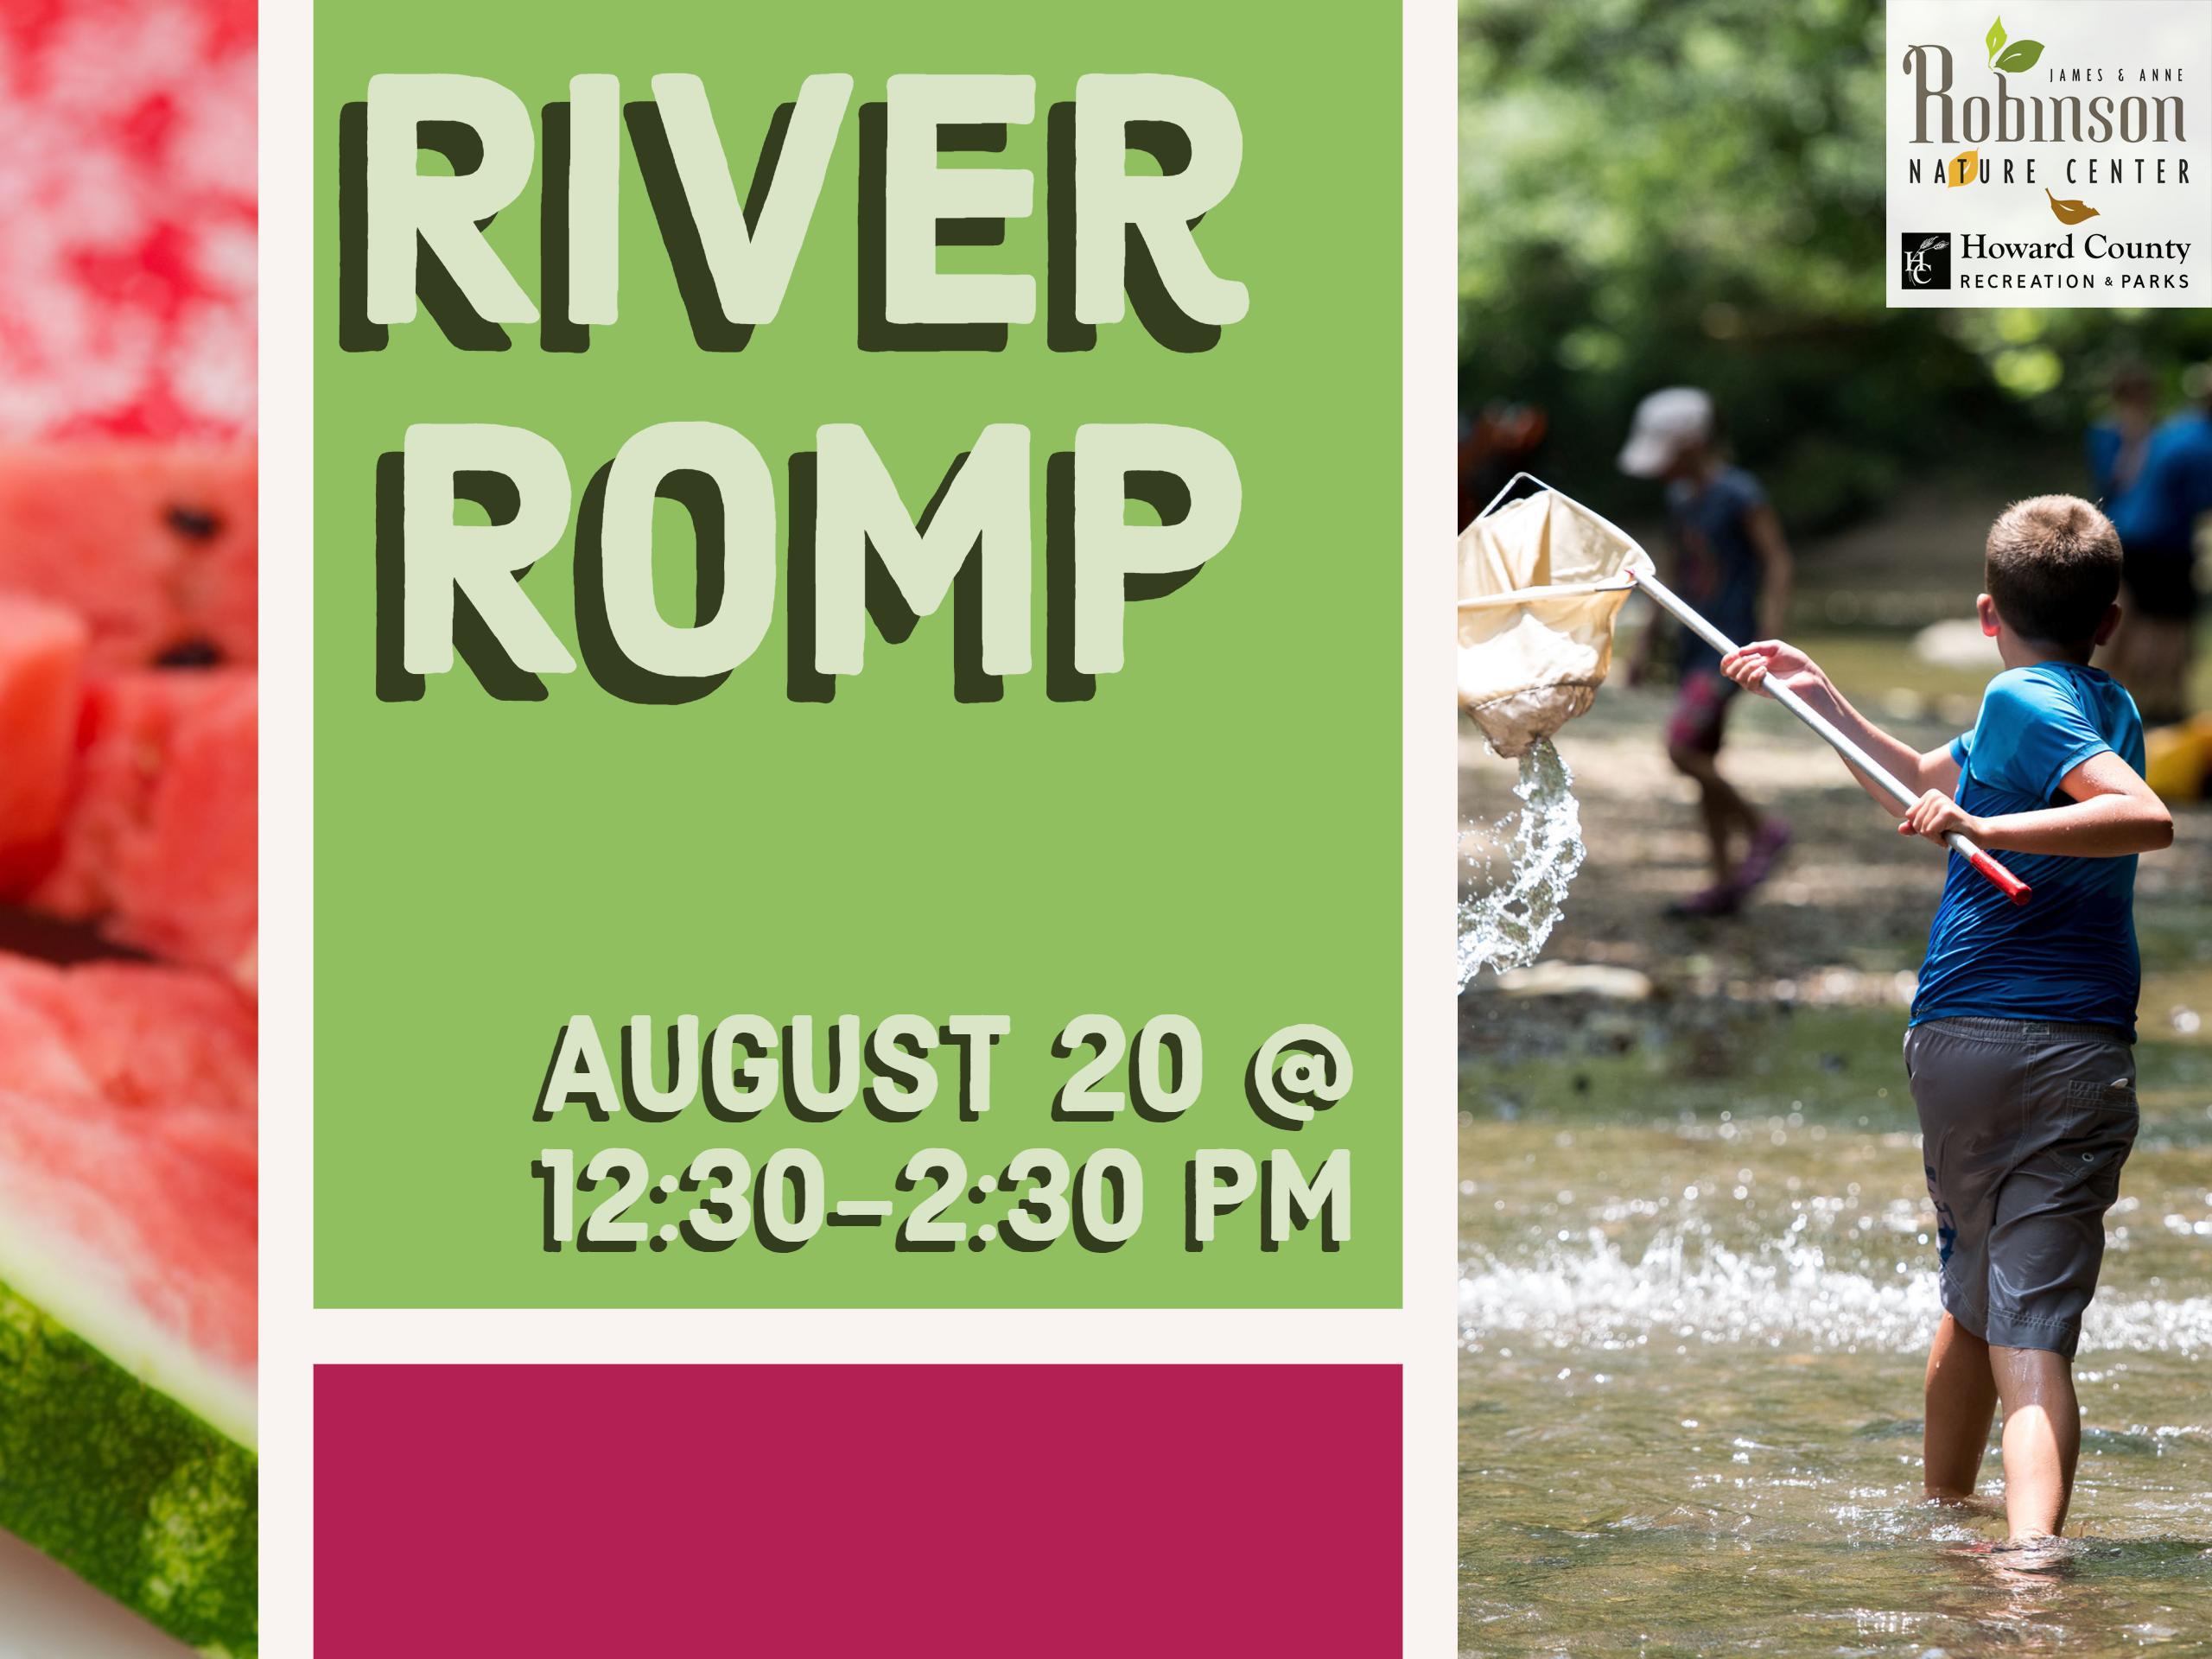 River Romp flyer